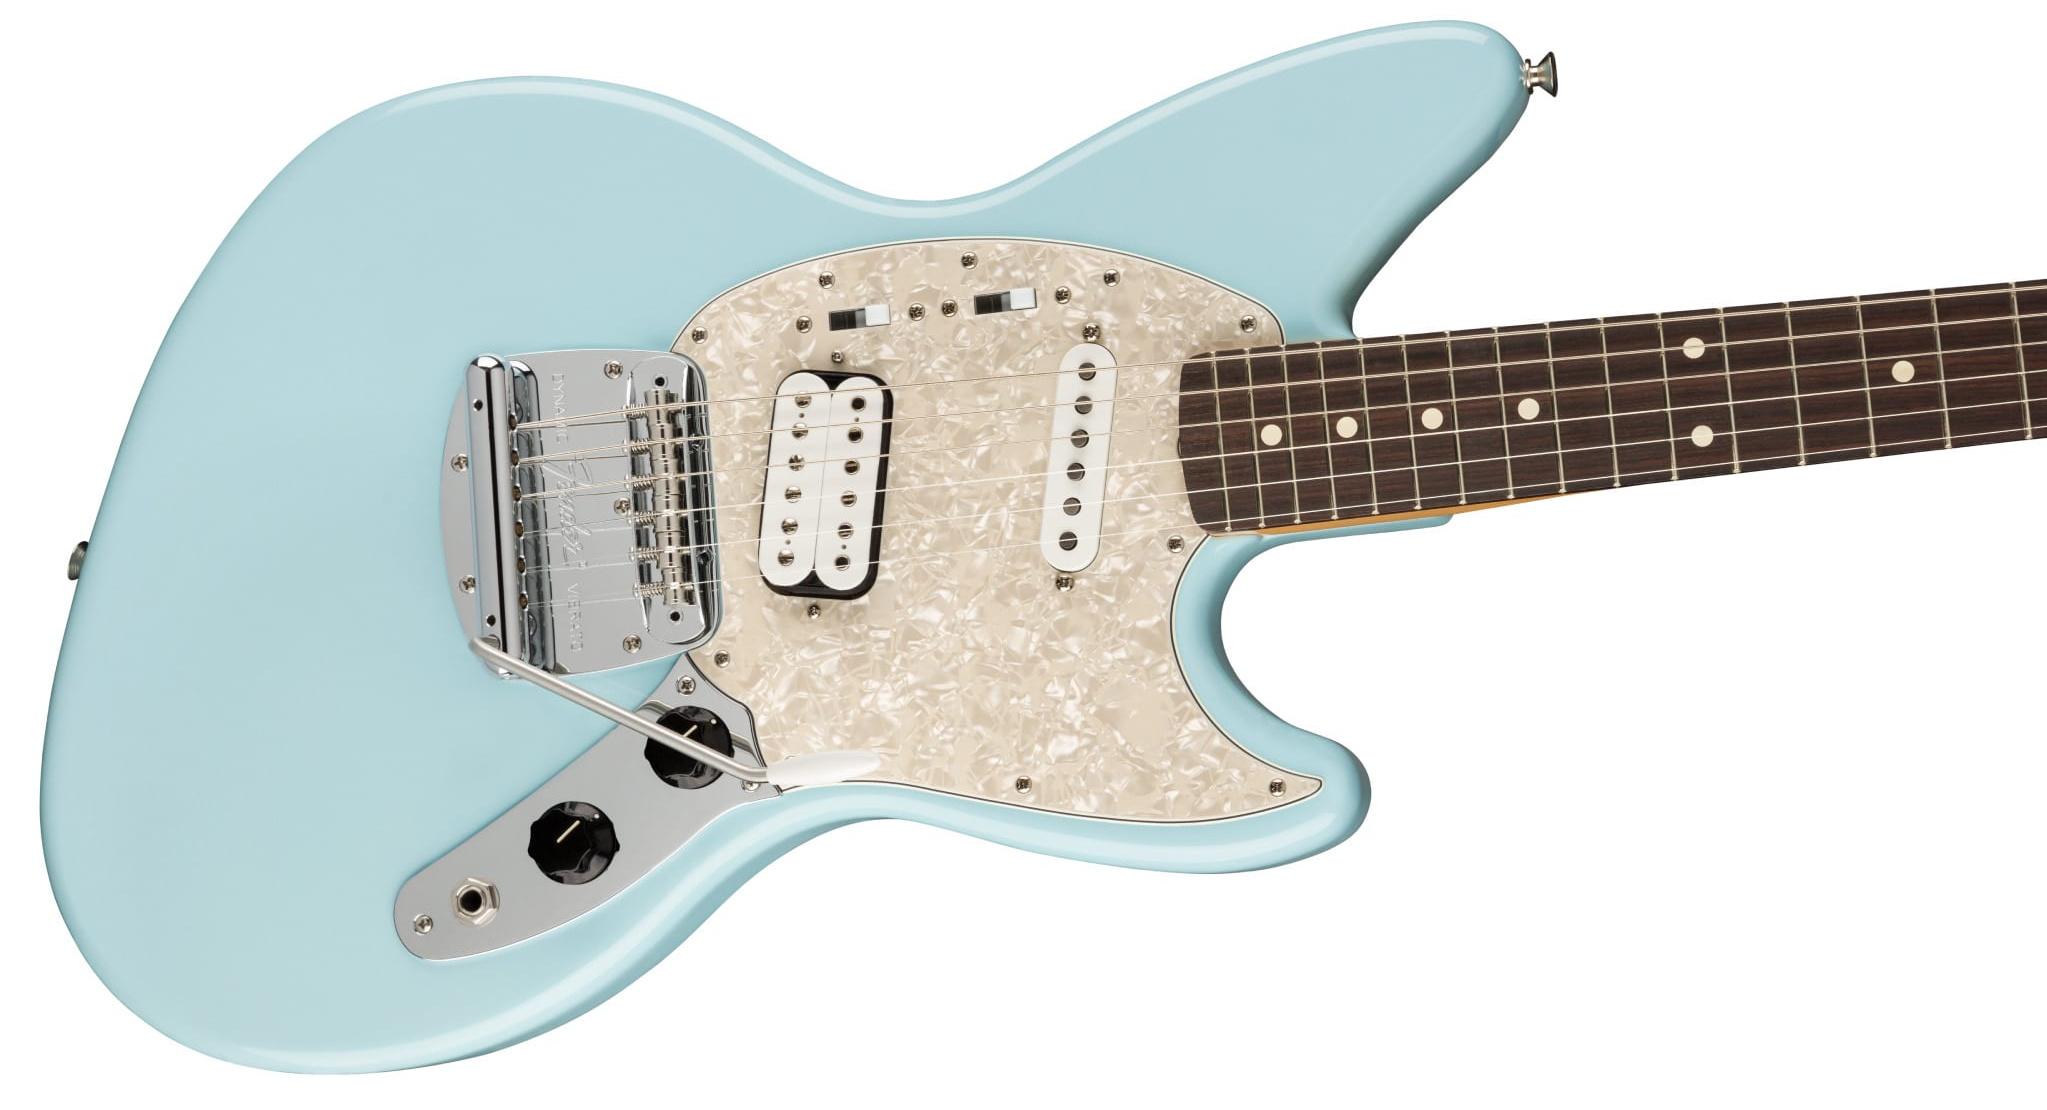 Kurt Cobain Jag-Stang Sonic Blue